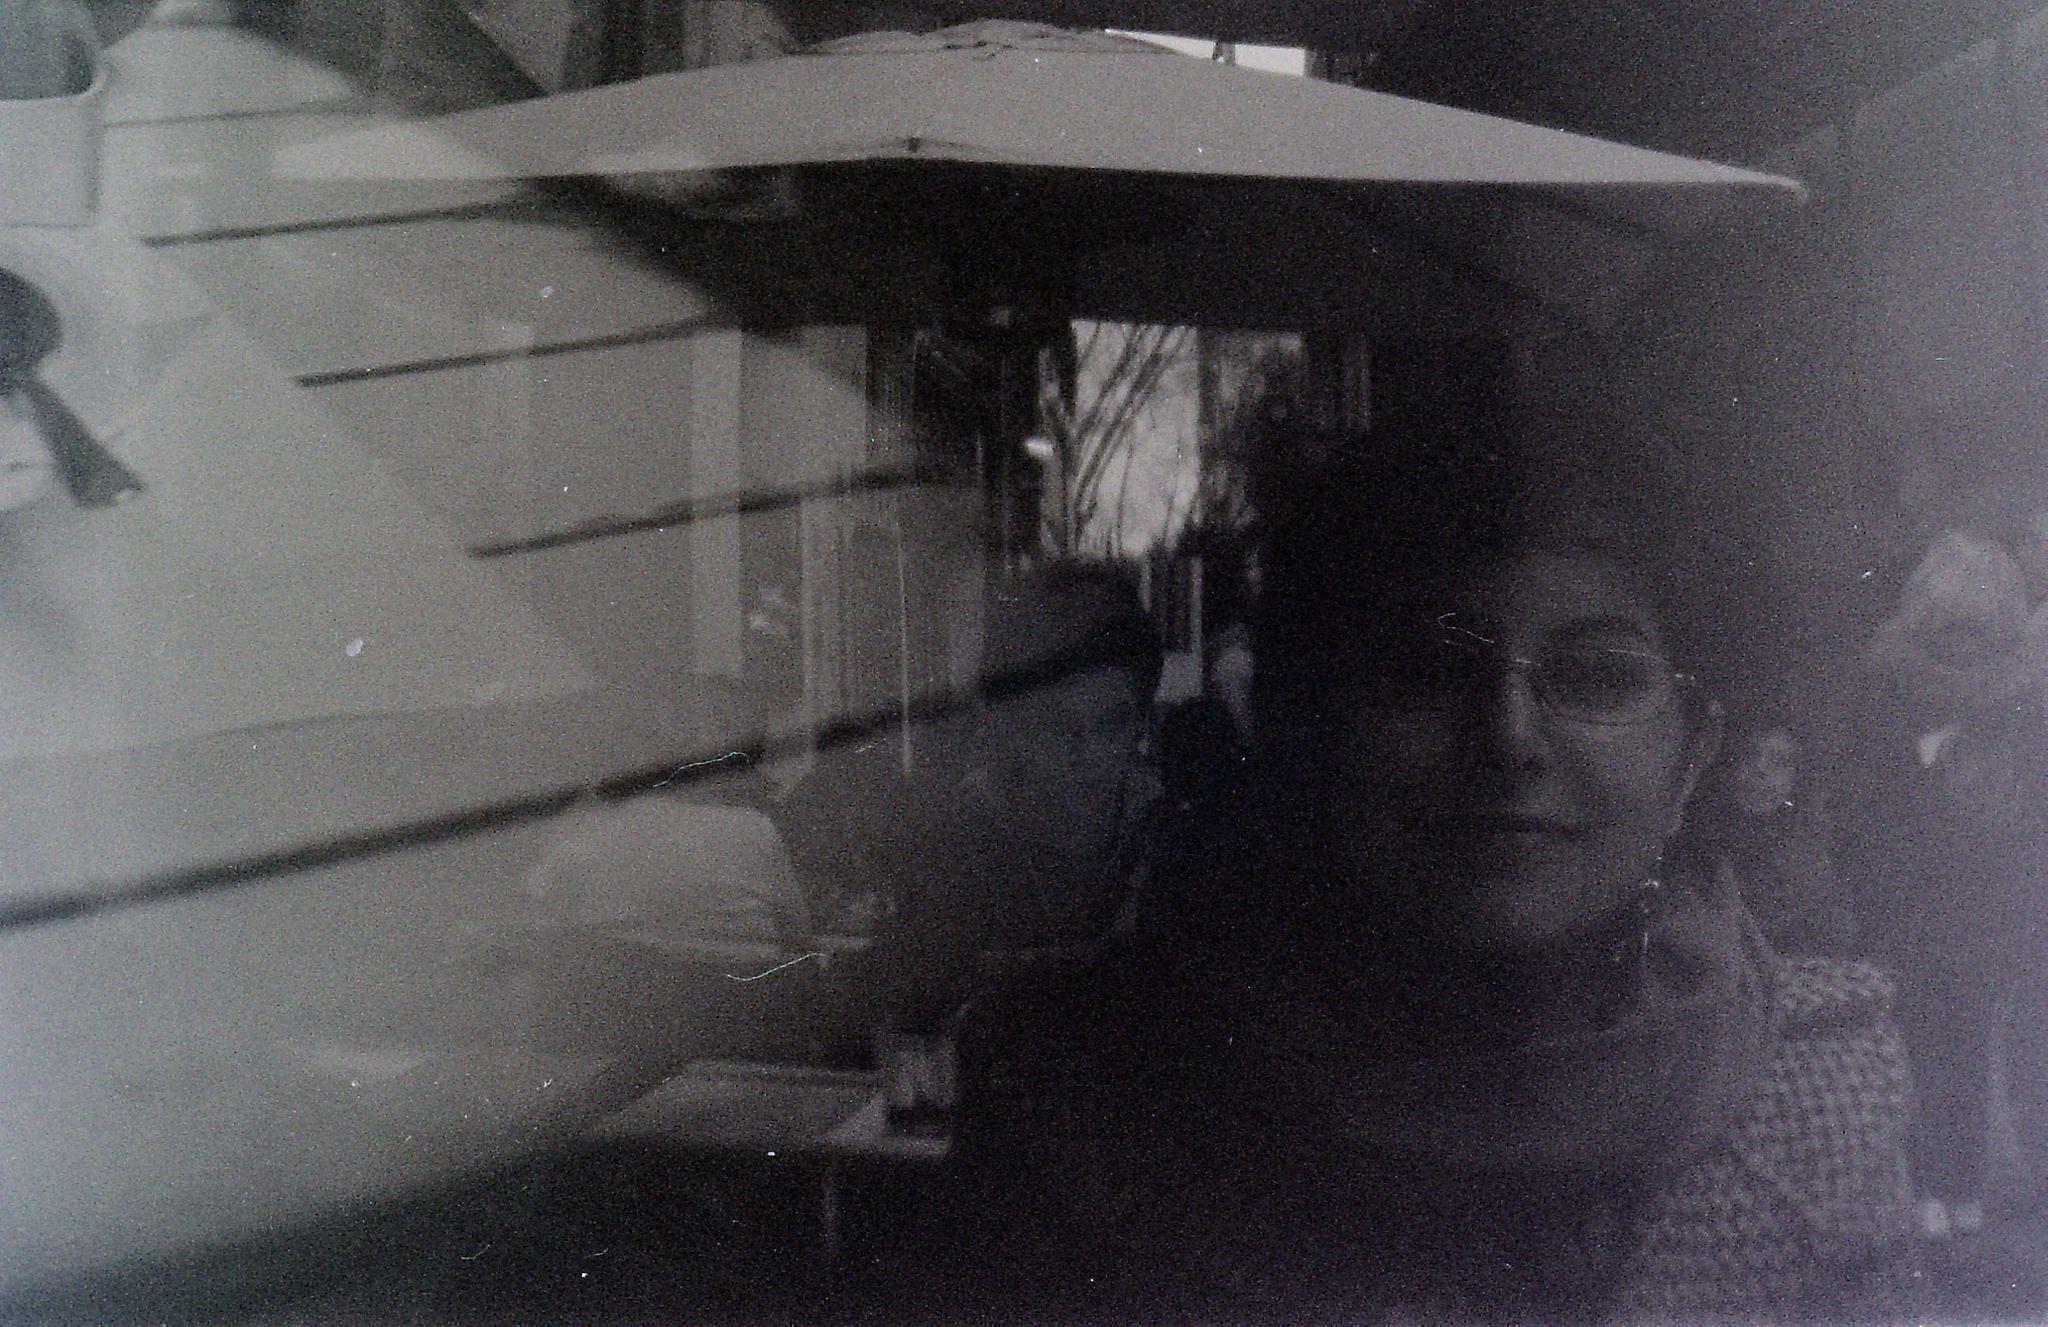 https://flic.kr/p/FxxEZf | Me, again! | Holga, Lomography Lomography #holga #analog #photography #blackandwhite #rome #lomography